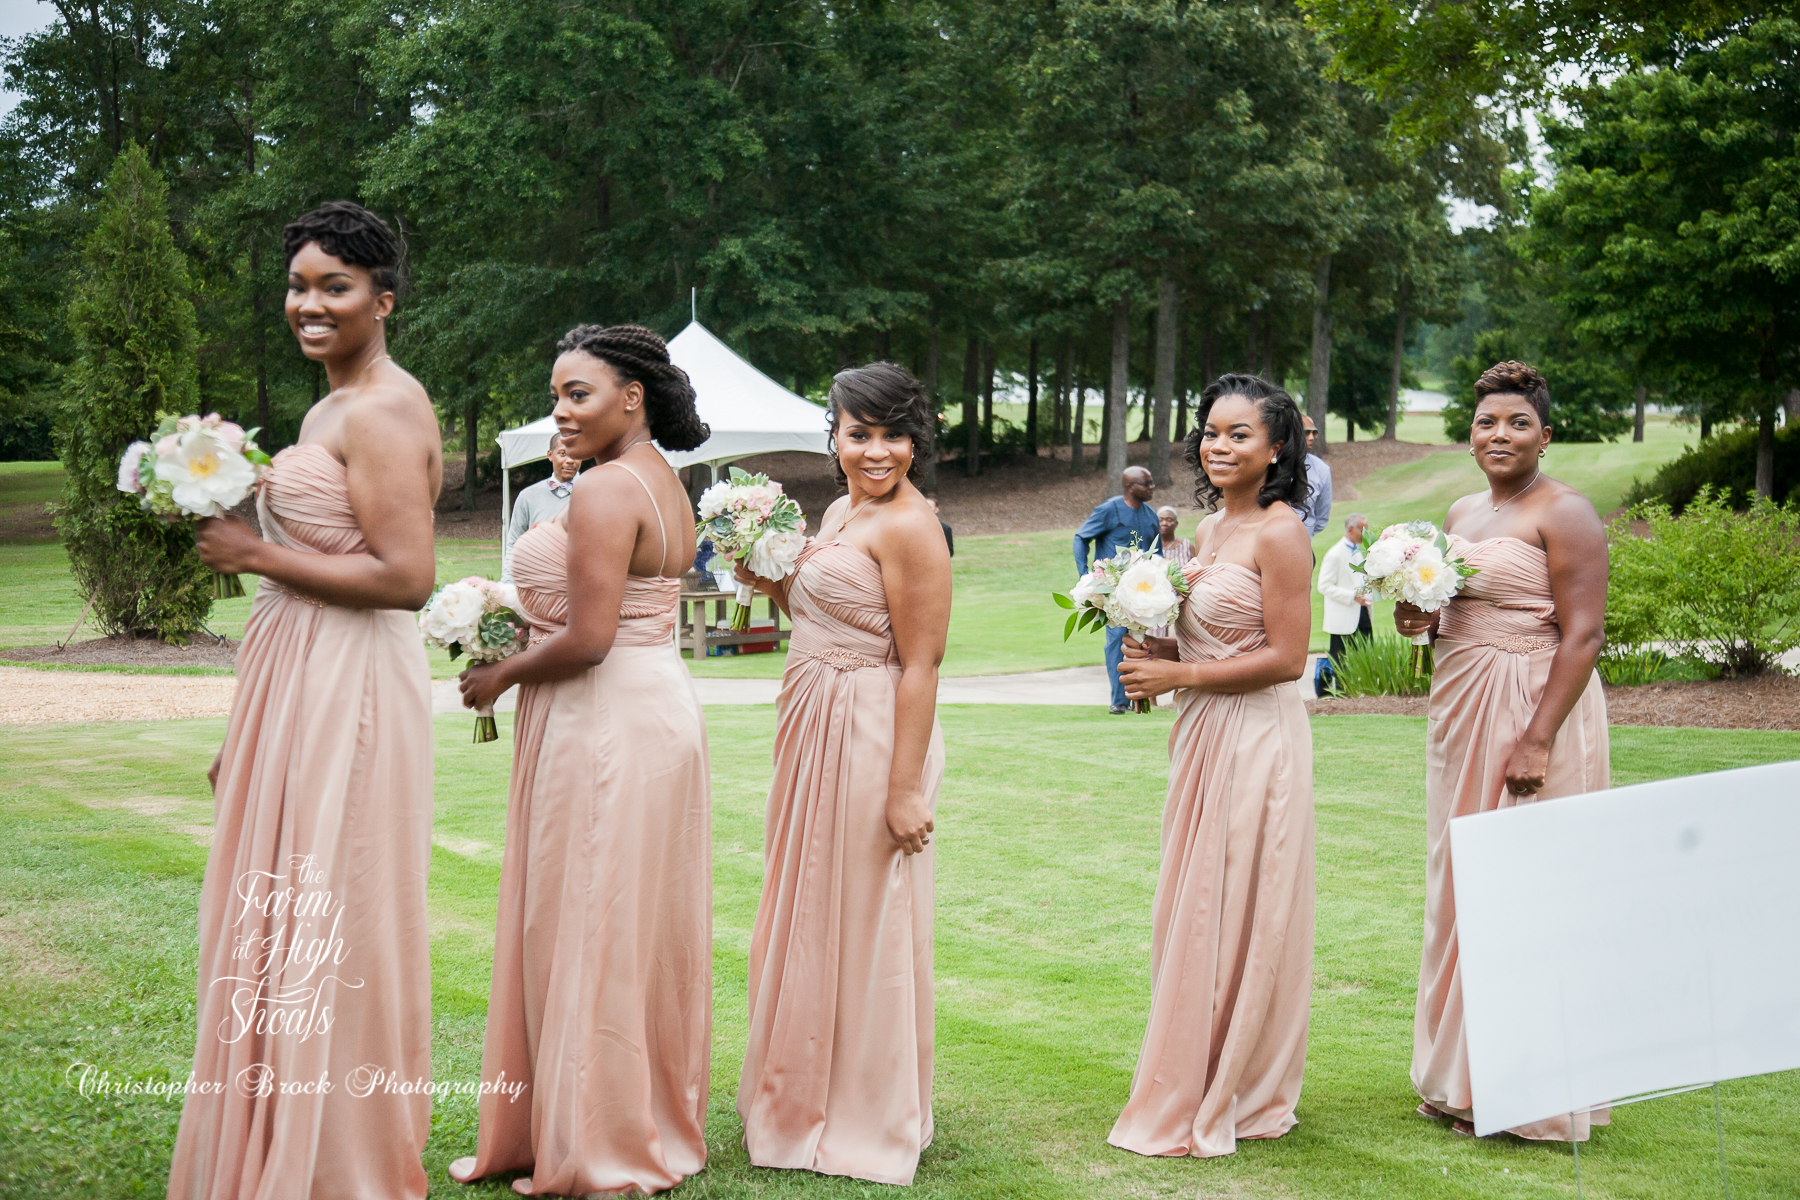 The Farm at High Shoals -- Atlanta Vineyard Wedding Venue (152 of 676)